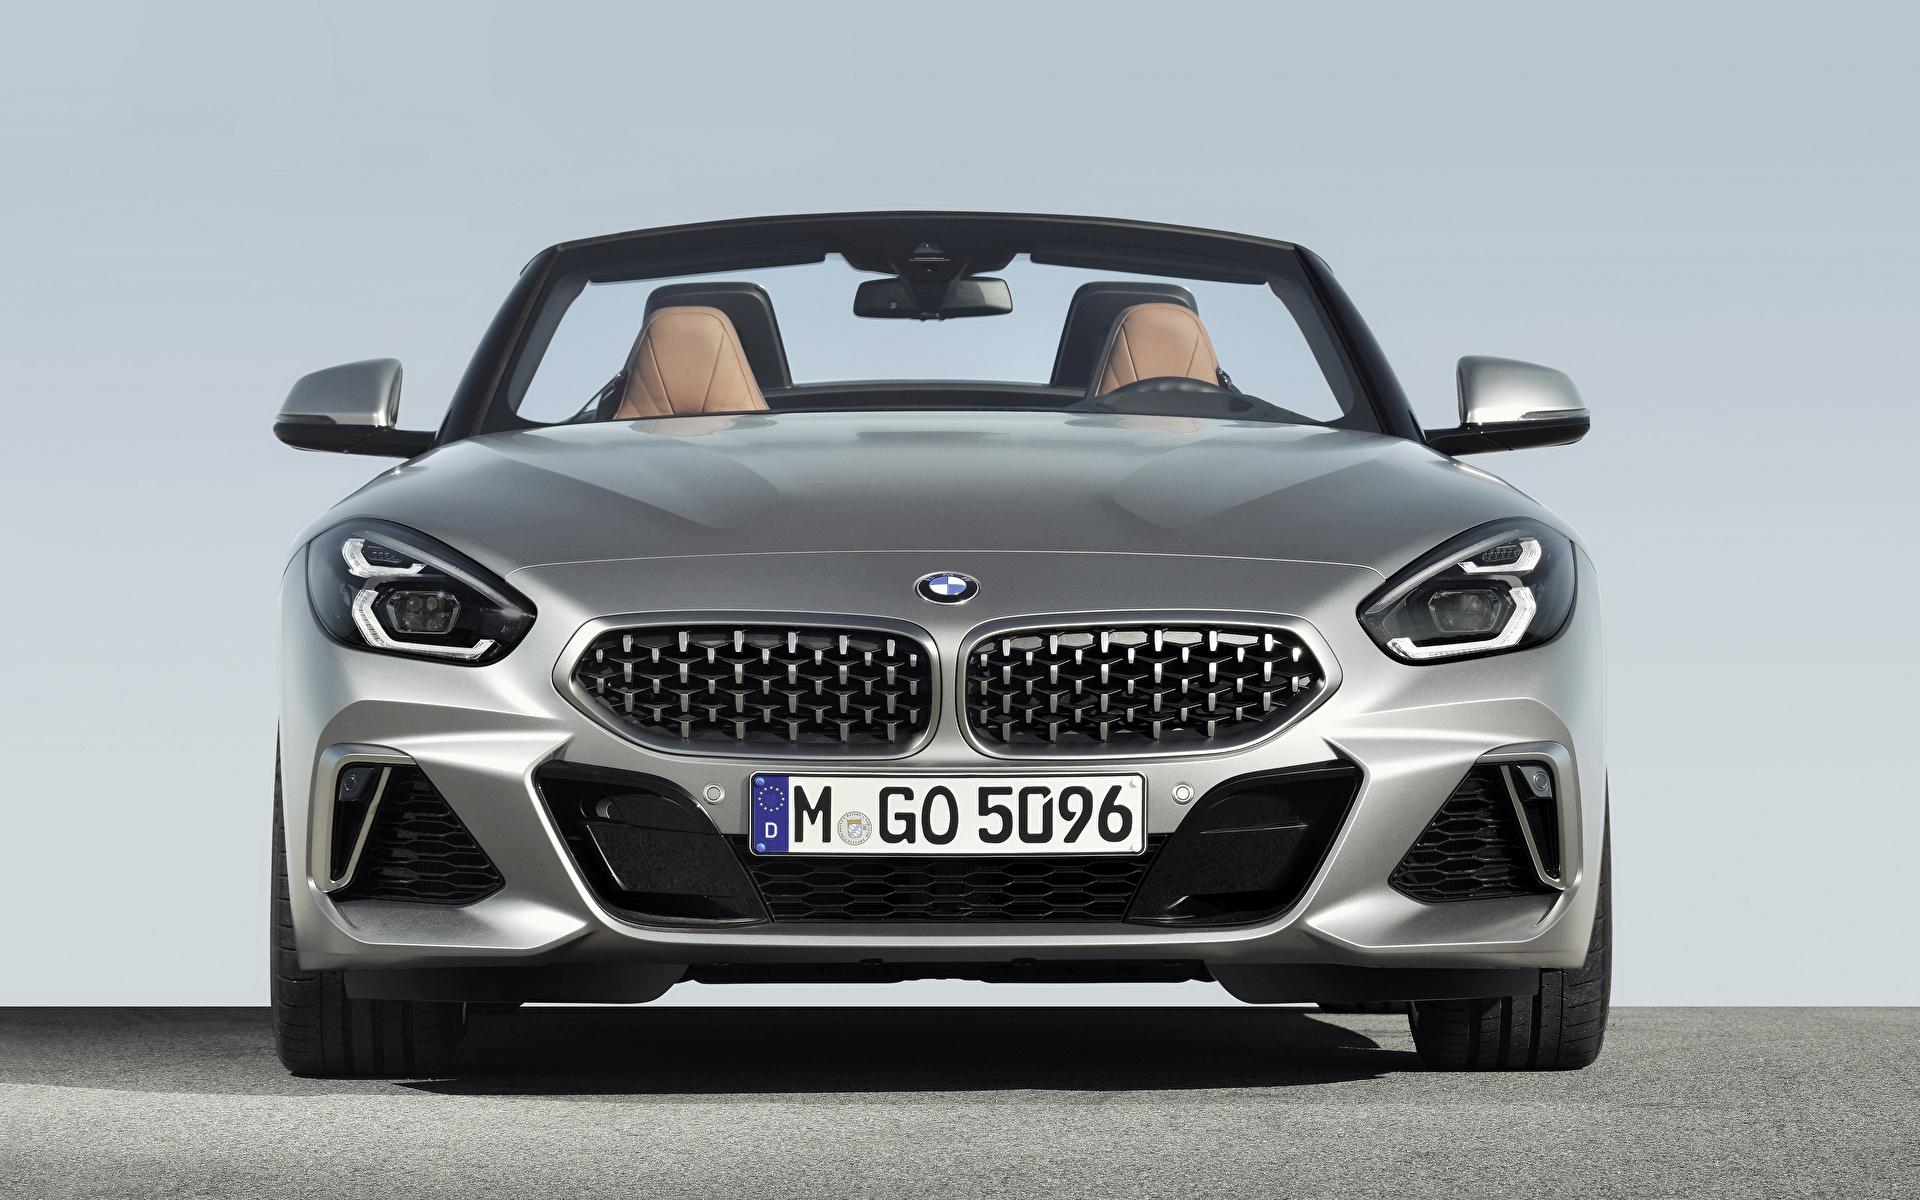 Обои BMW Z4 M40i Z4 2019 G29 Родстер Серебристый Машины Спереди 1920x1200 БМВ Авто Автомобили